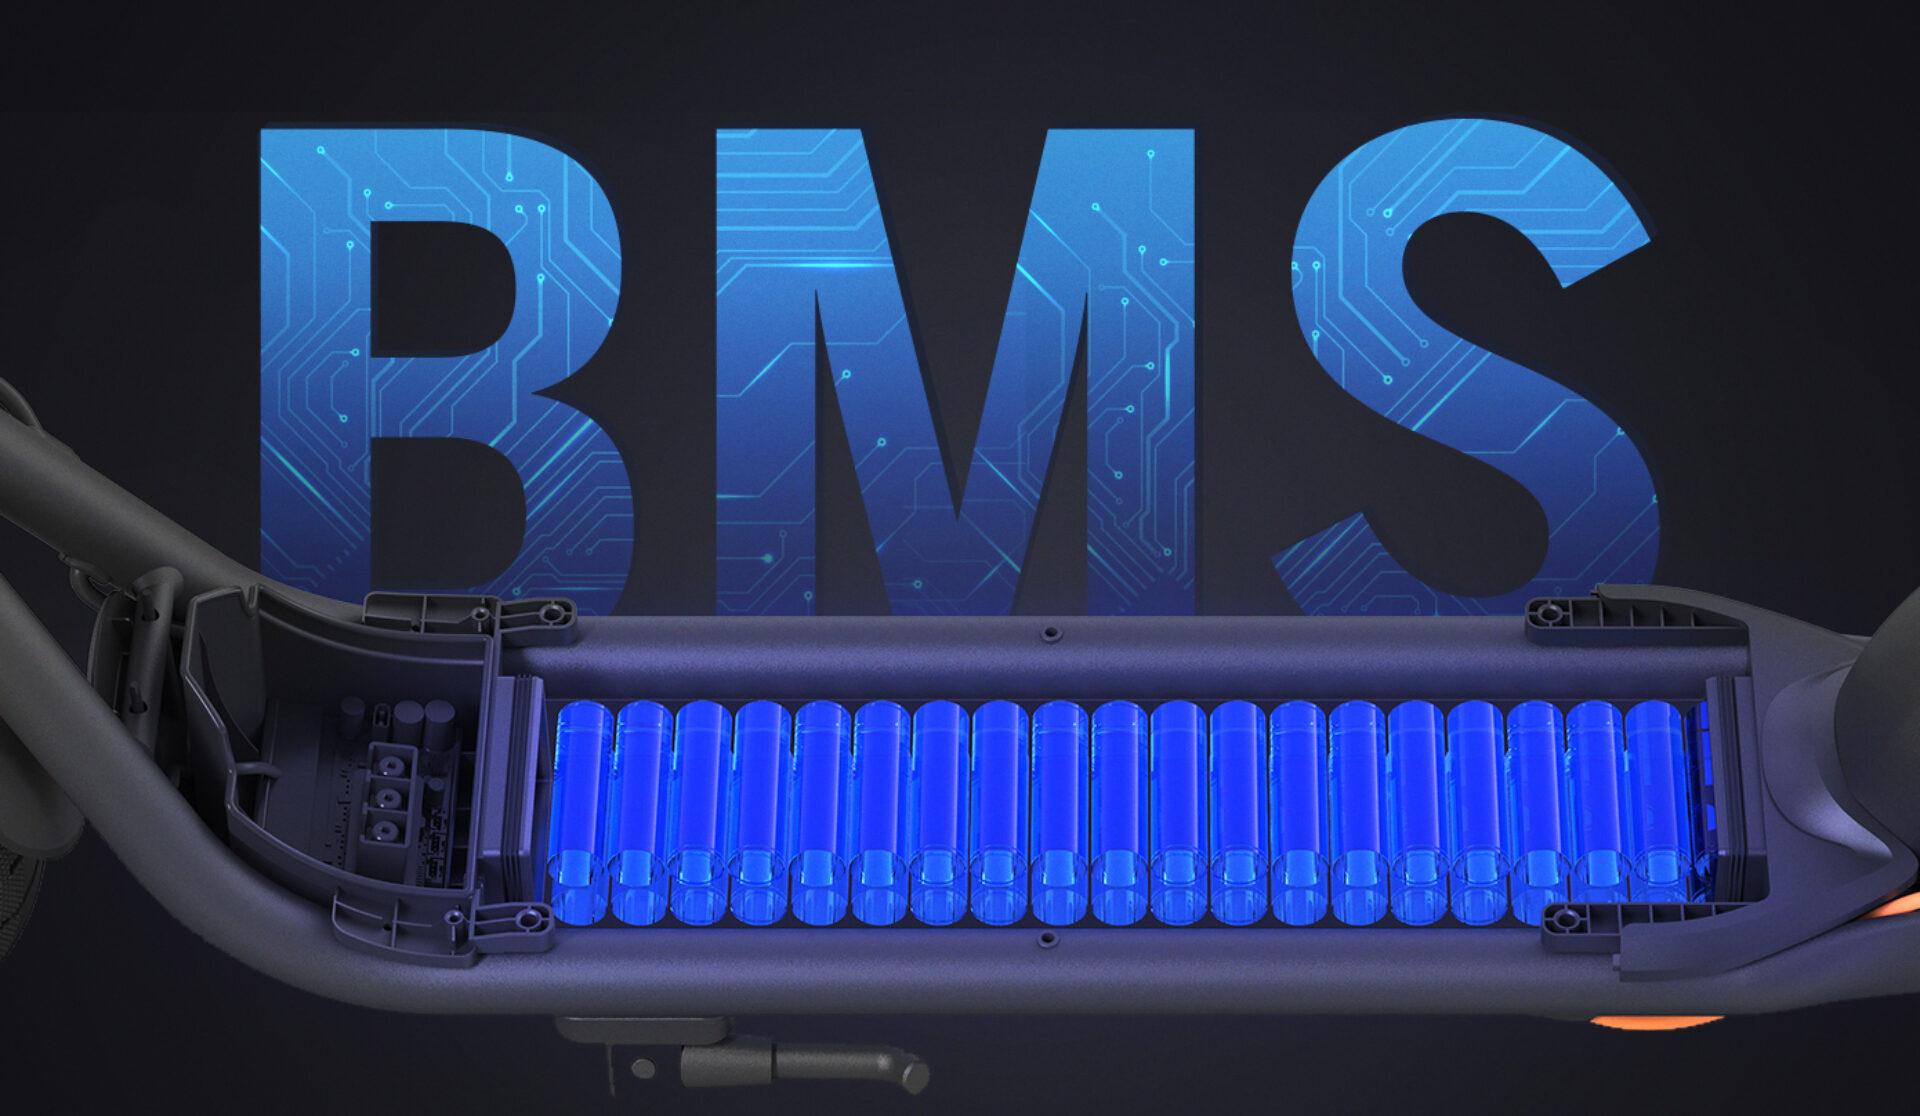 Smart Battery Management System (BMS)